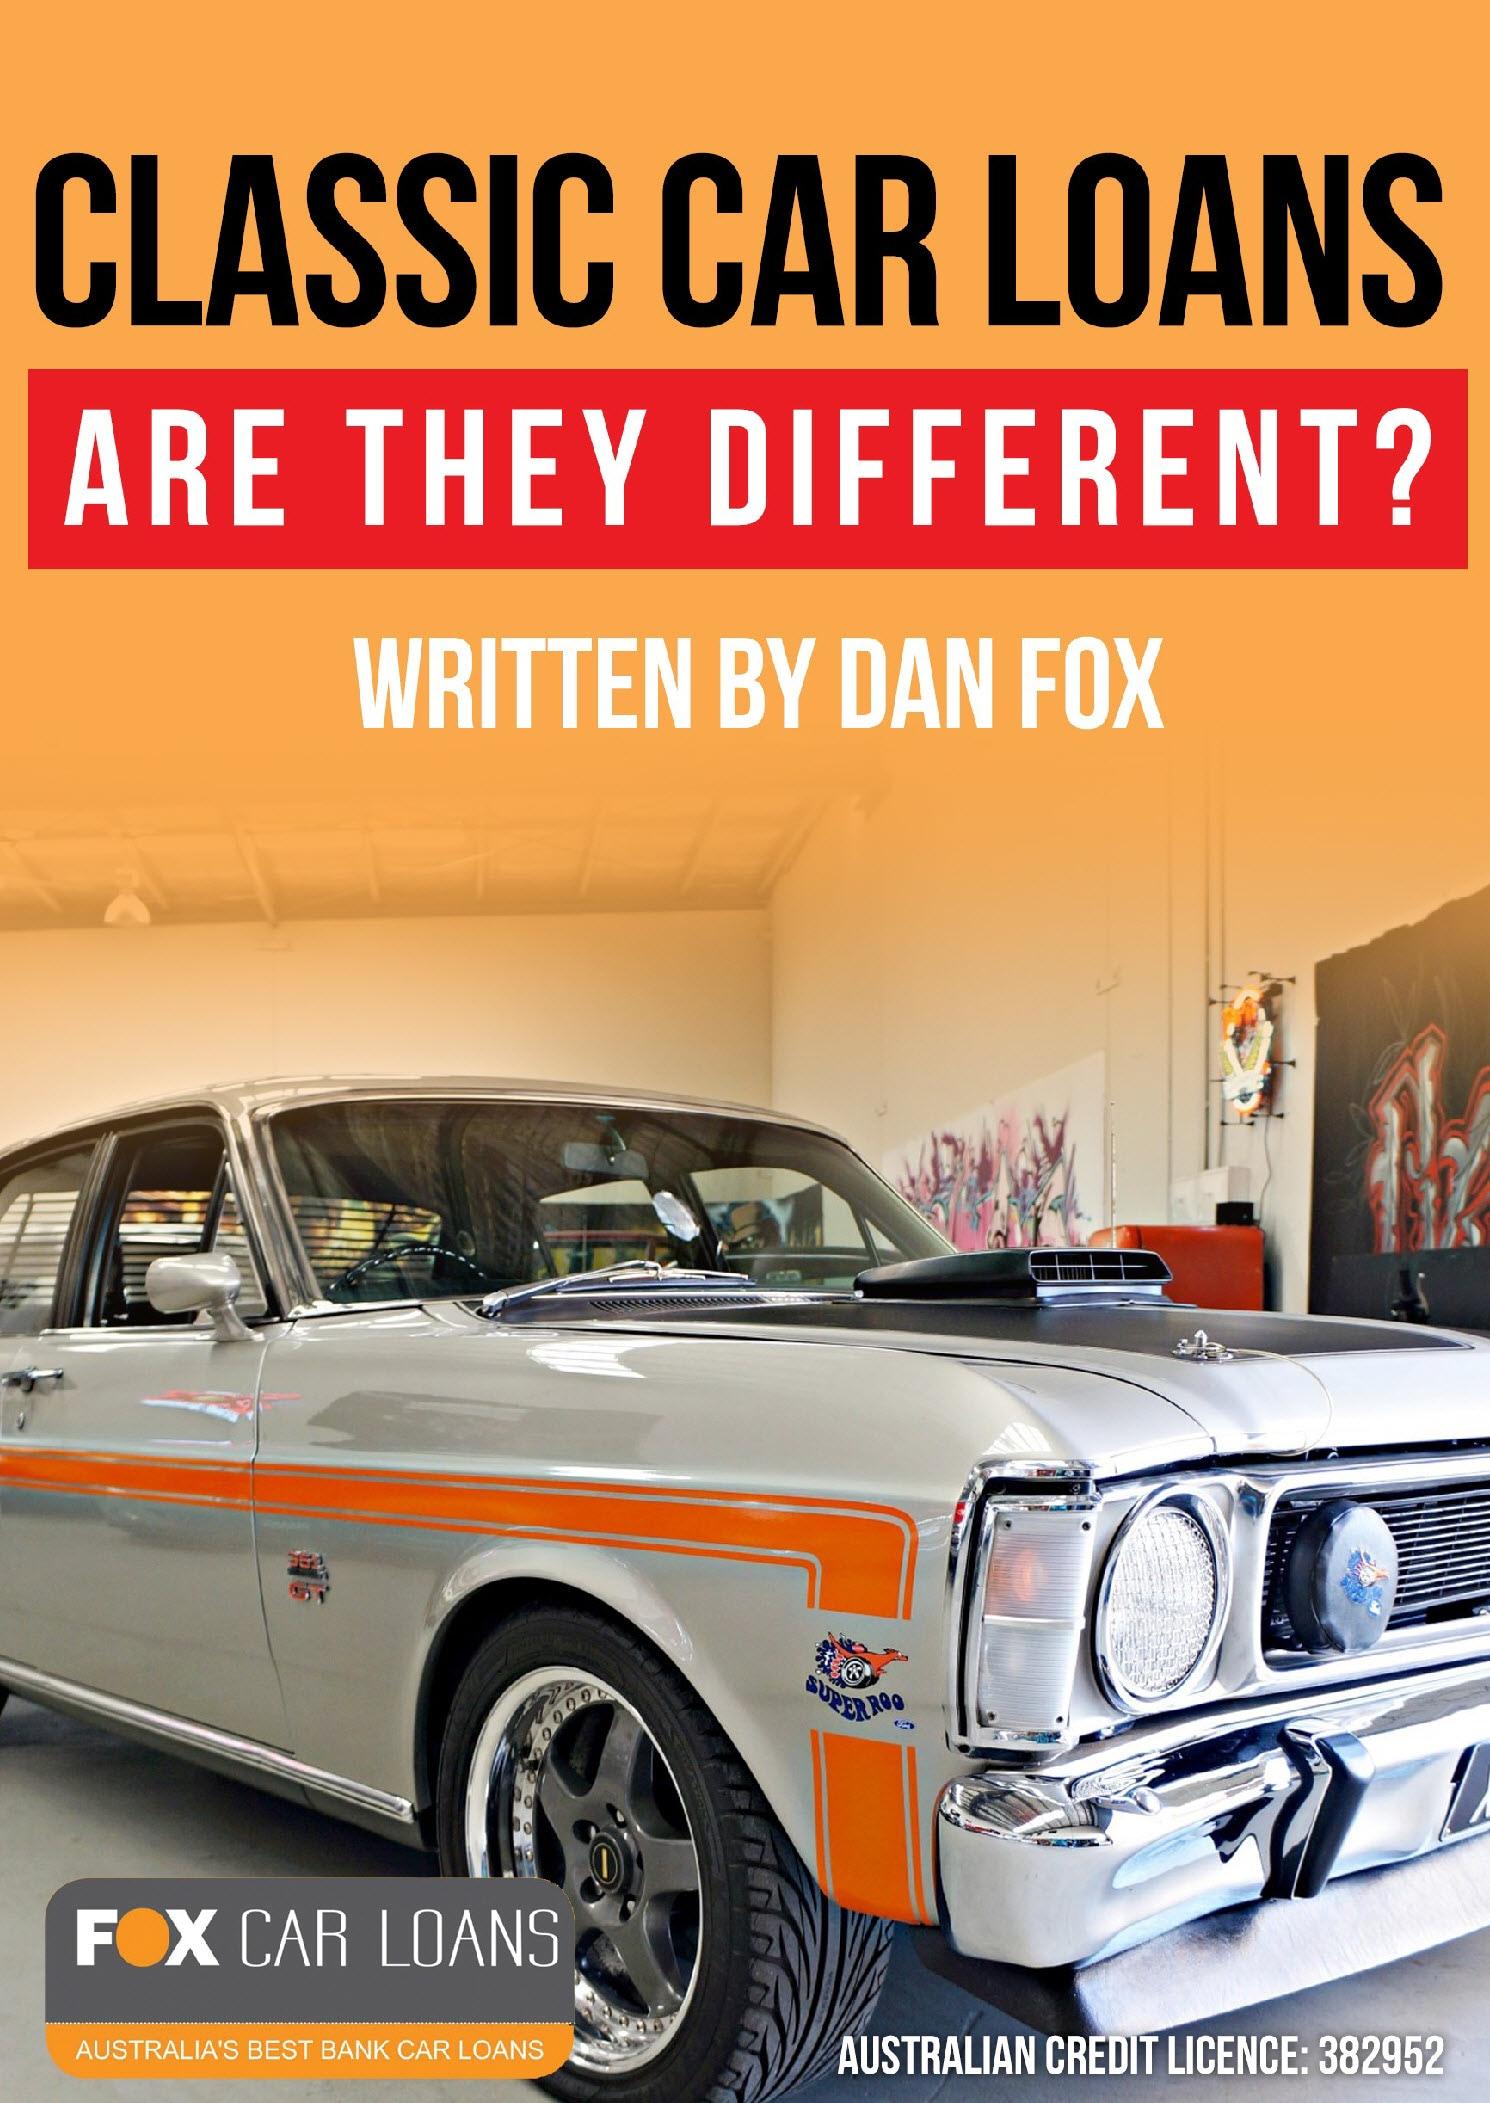 Fox Car Loans - Car Loans & Motor Vehicle Finance - REDCLIFFE